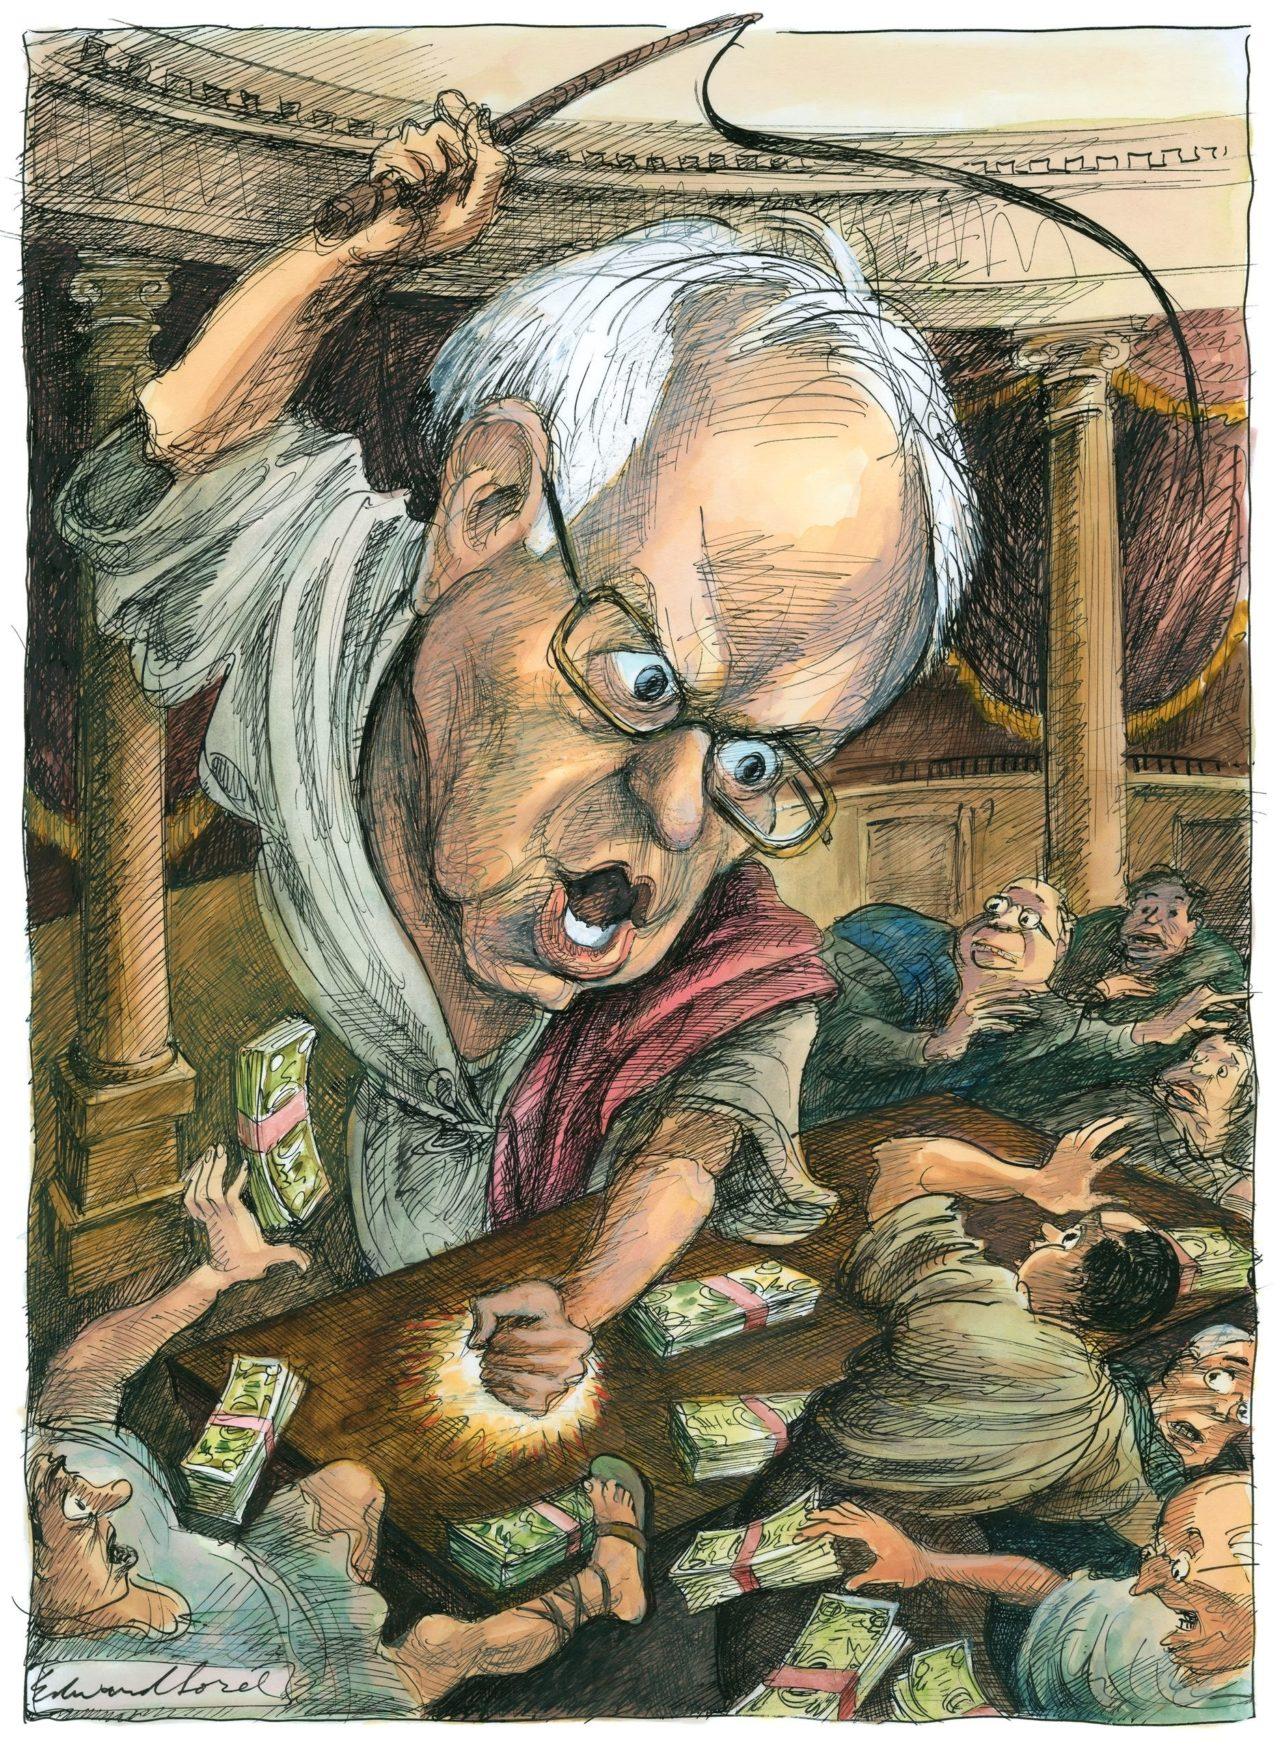 New Yorker depiction of Bernie Sanders